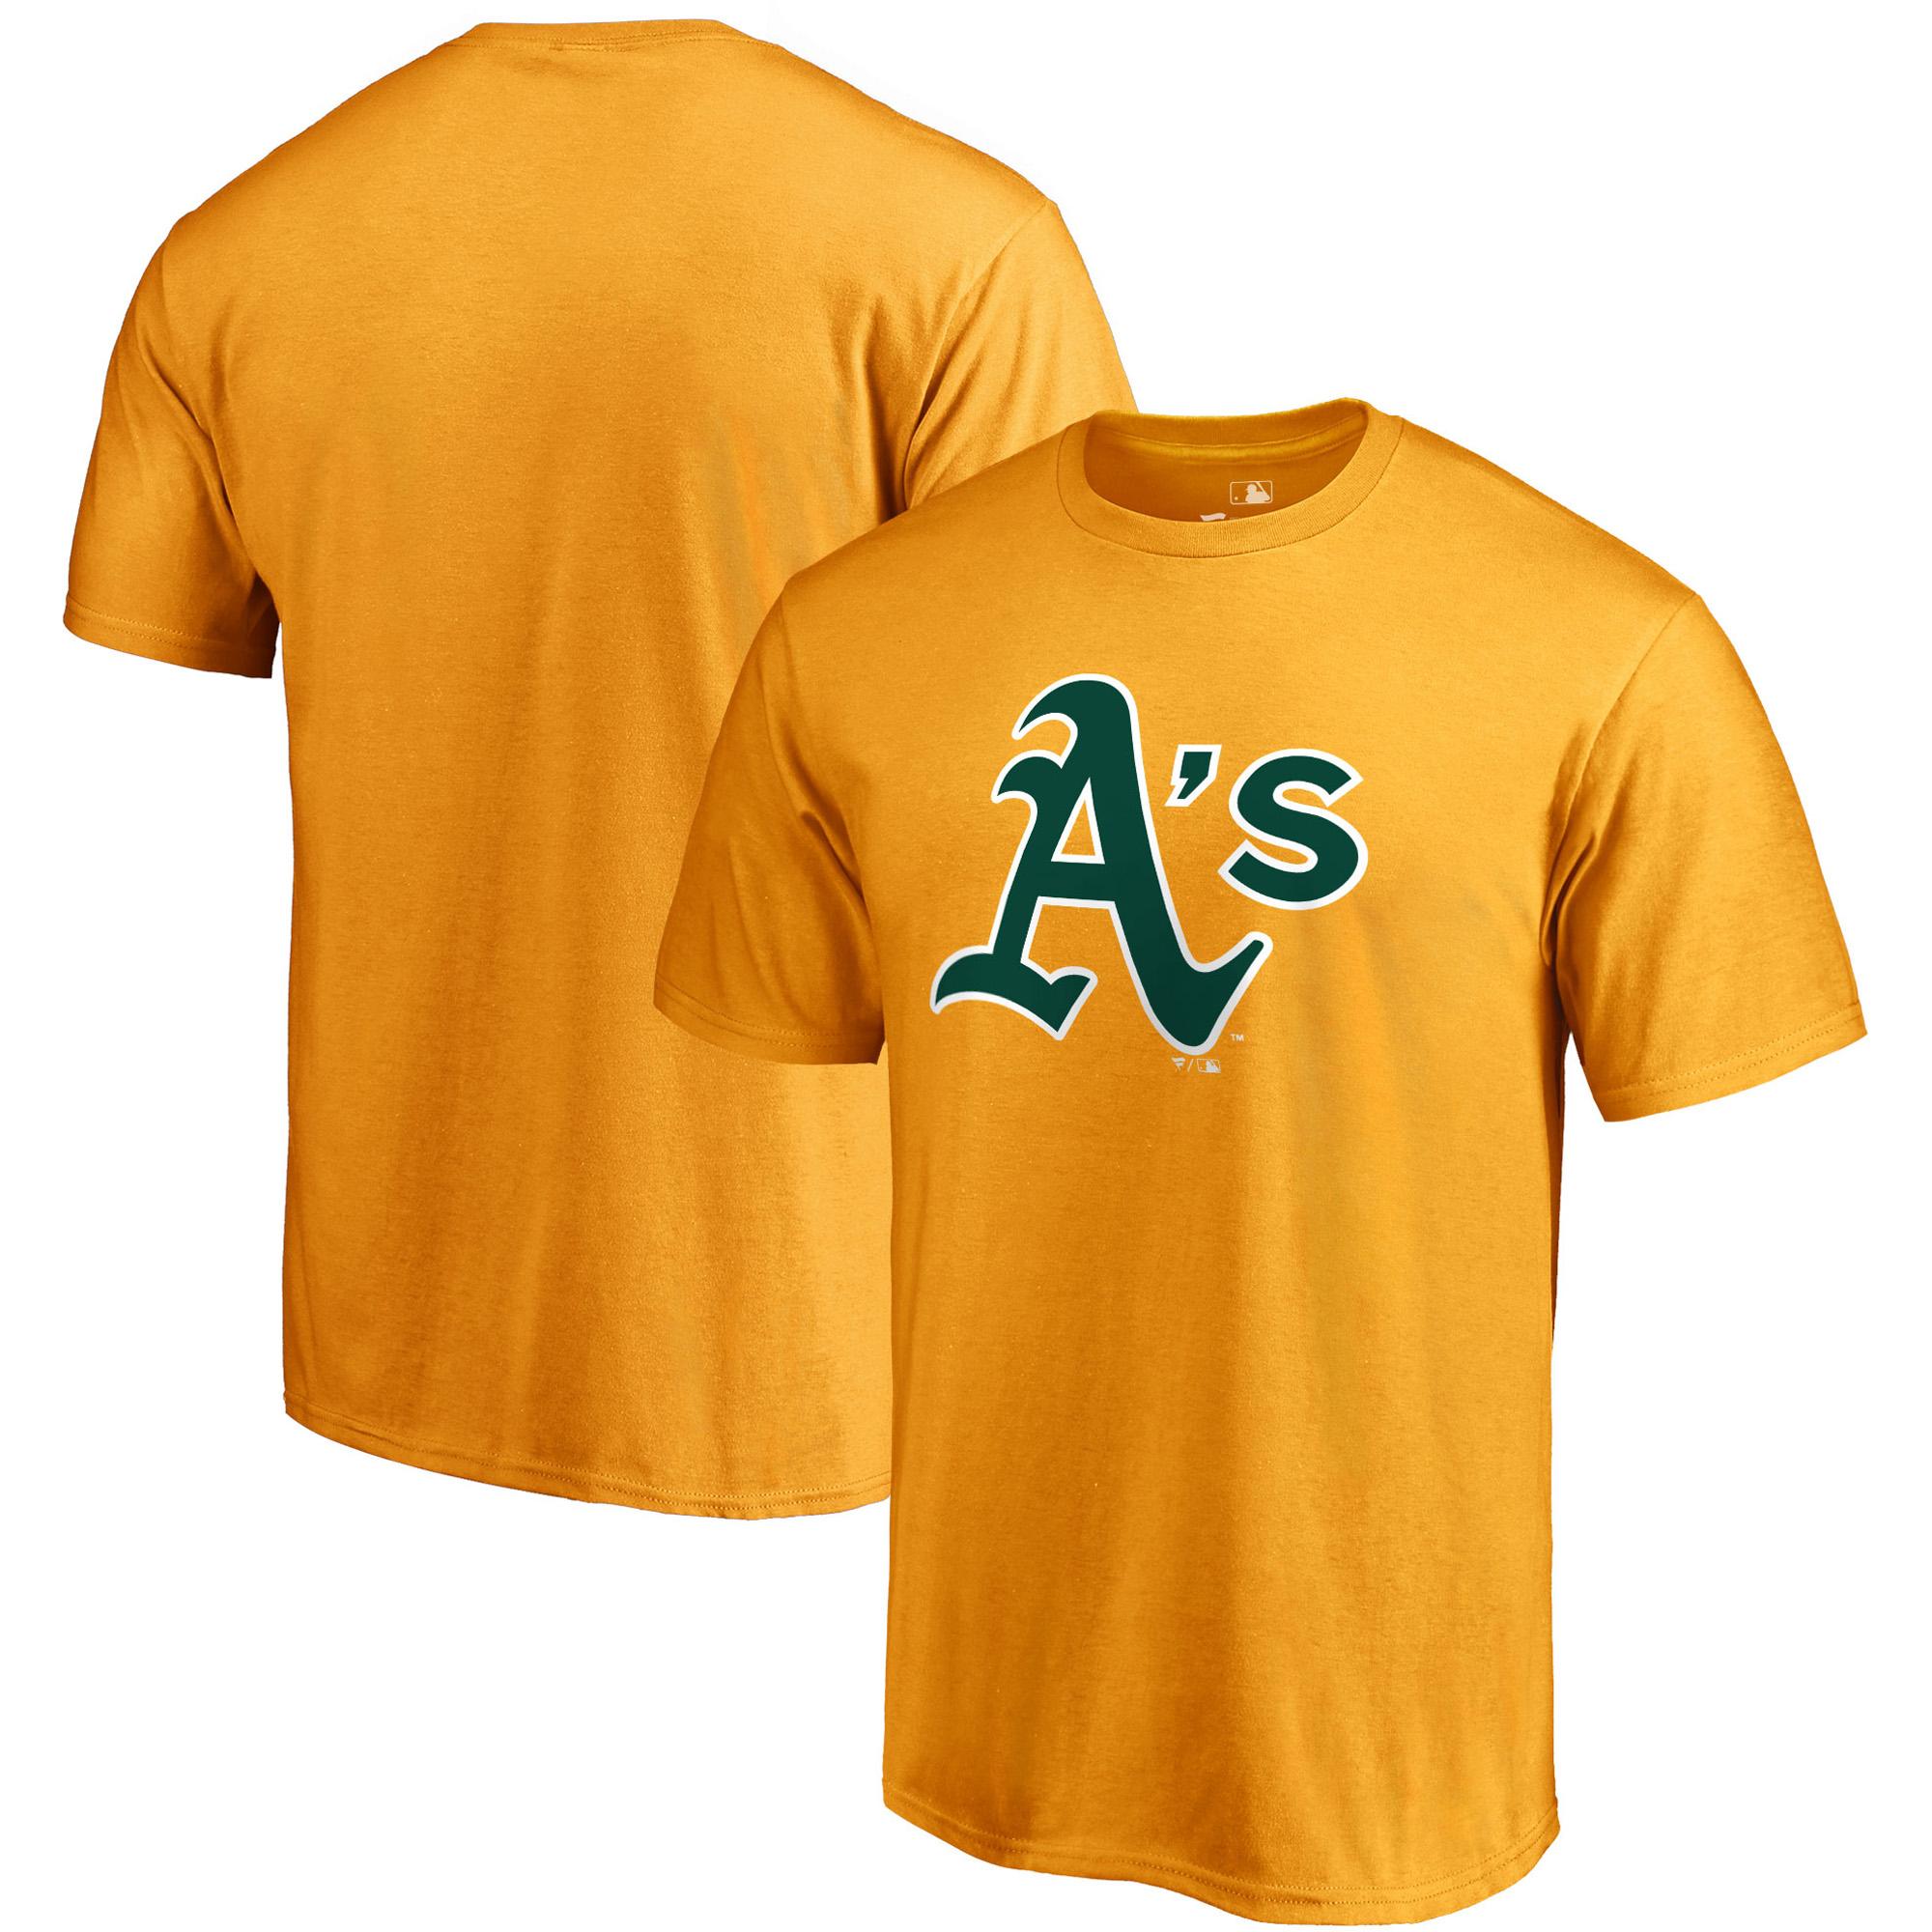 Oakland Athletics Fanatics Branded Primary Logo T-Shirt - Gold